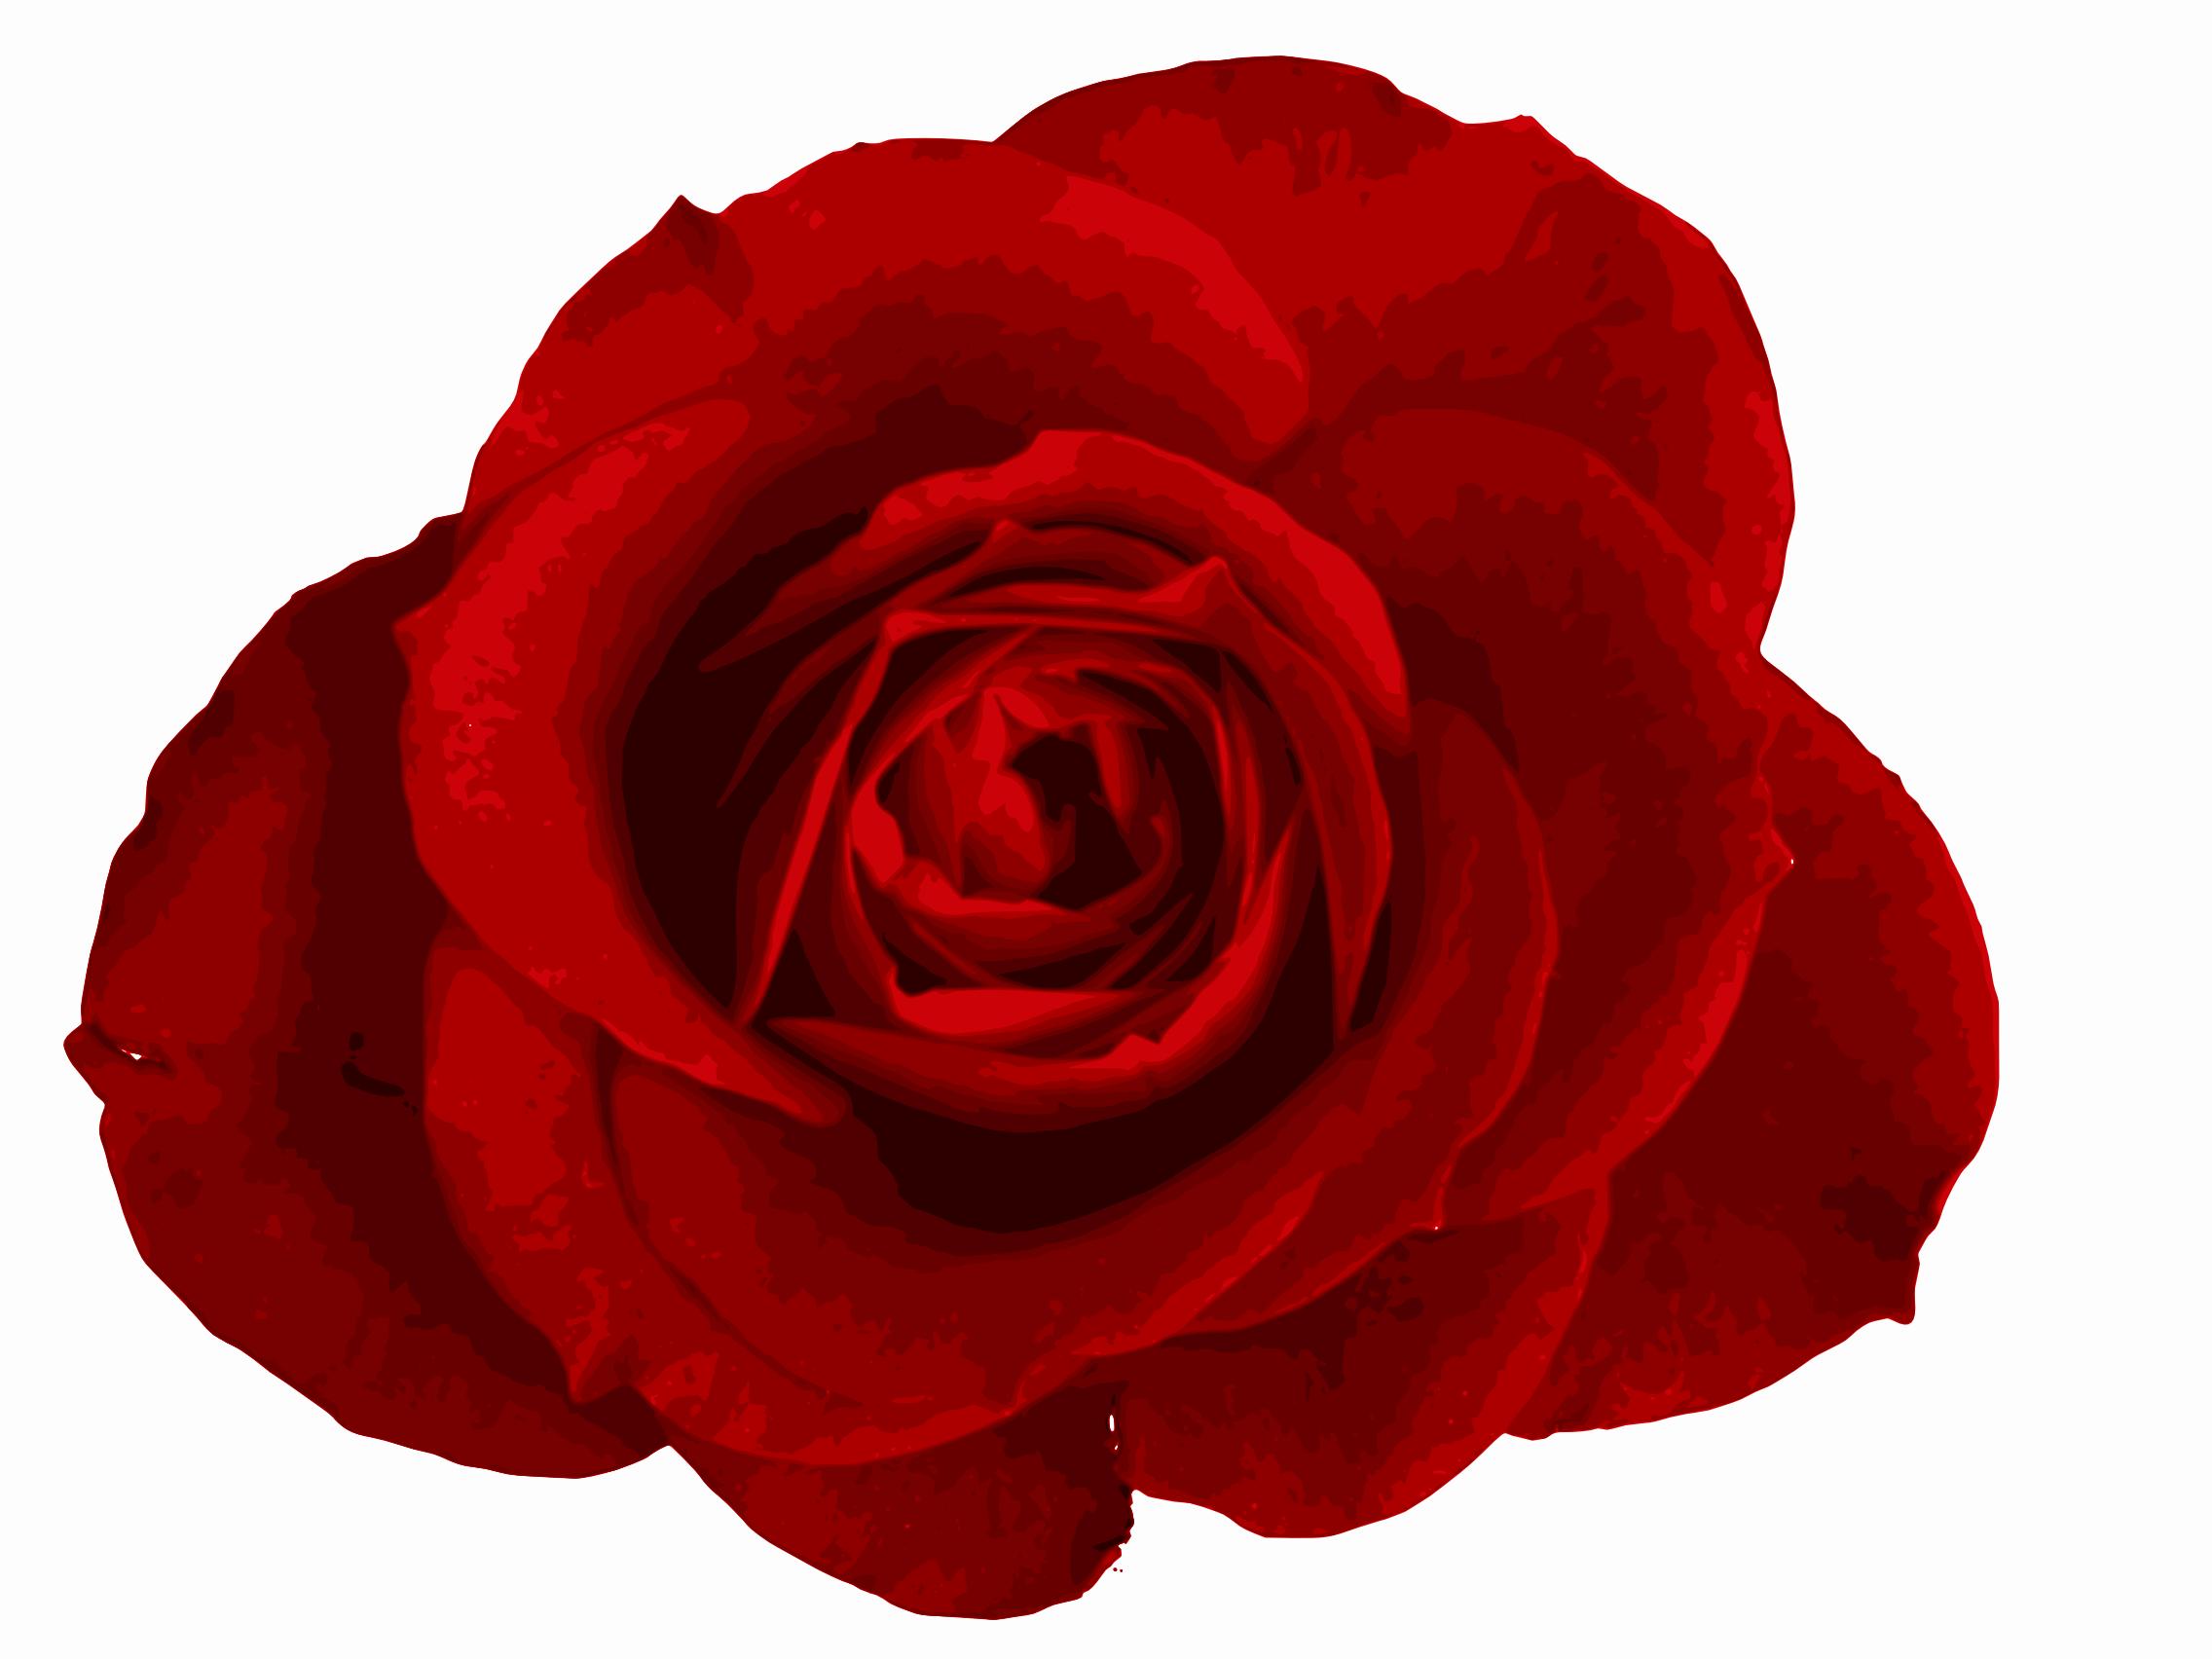 Red Rose Png Image Transparent Onlygfx Com